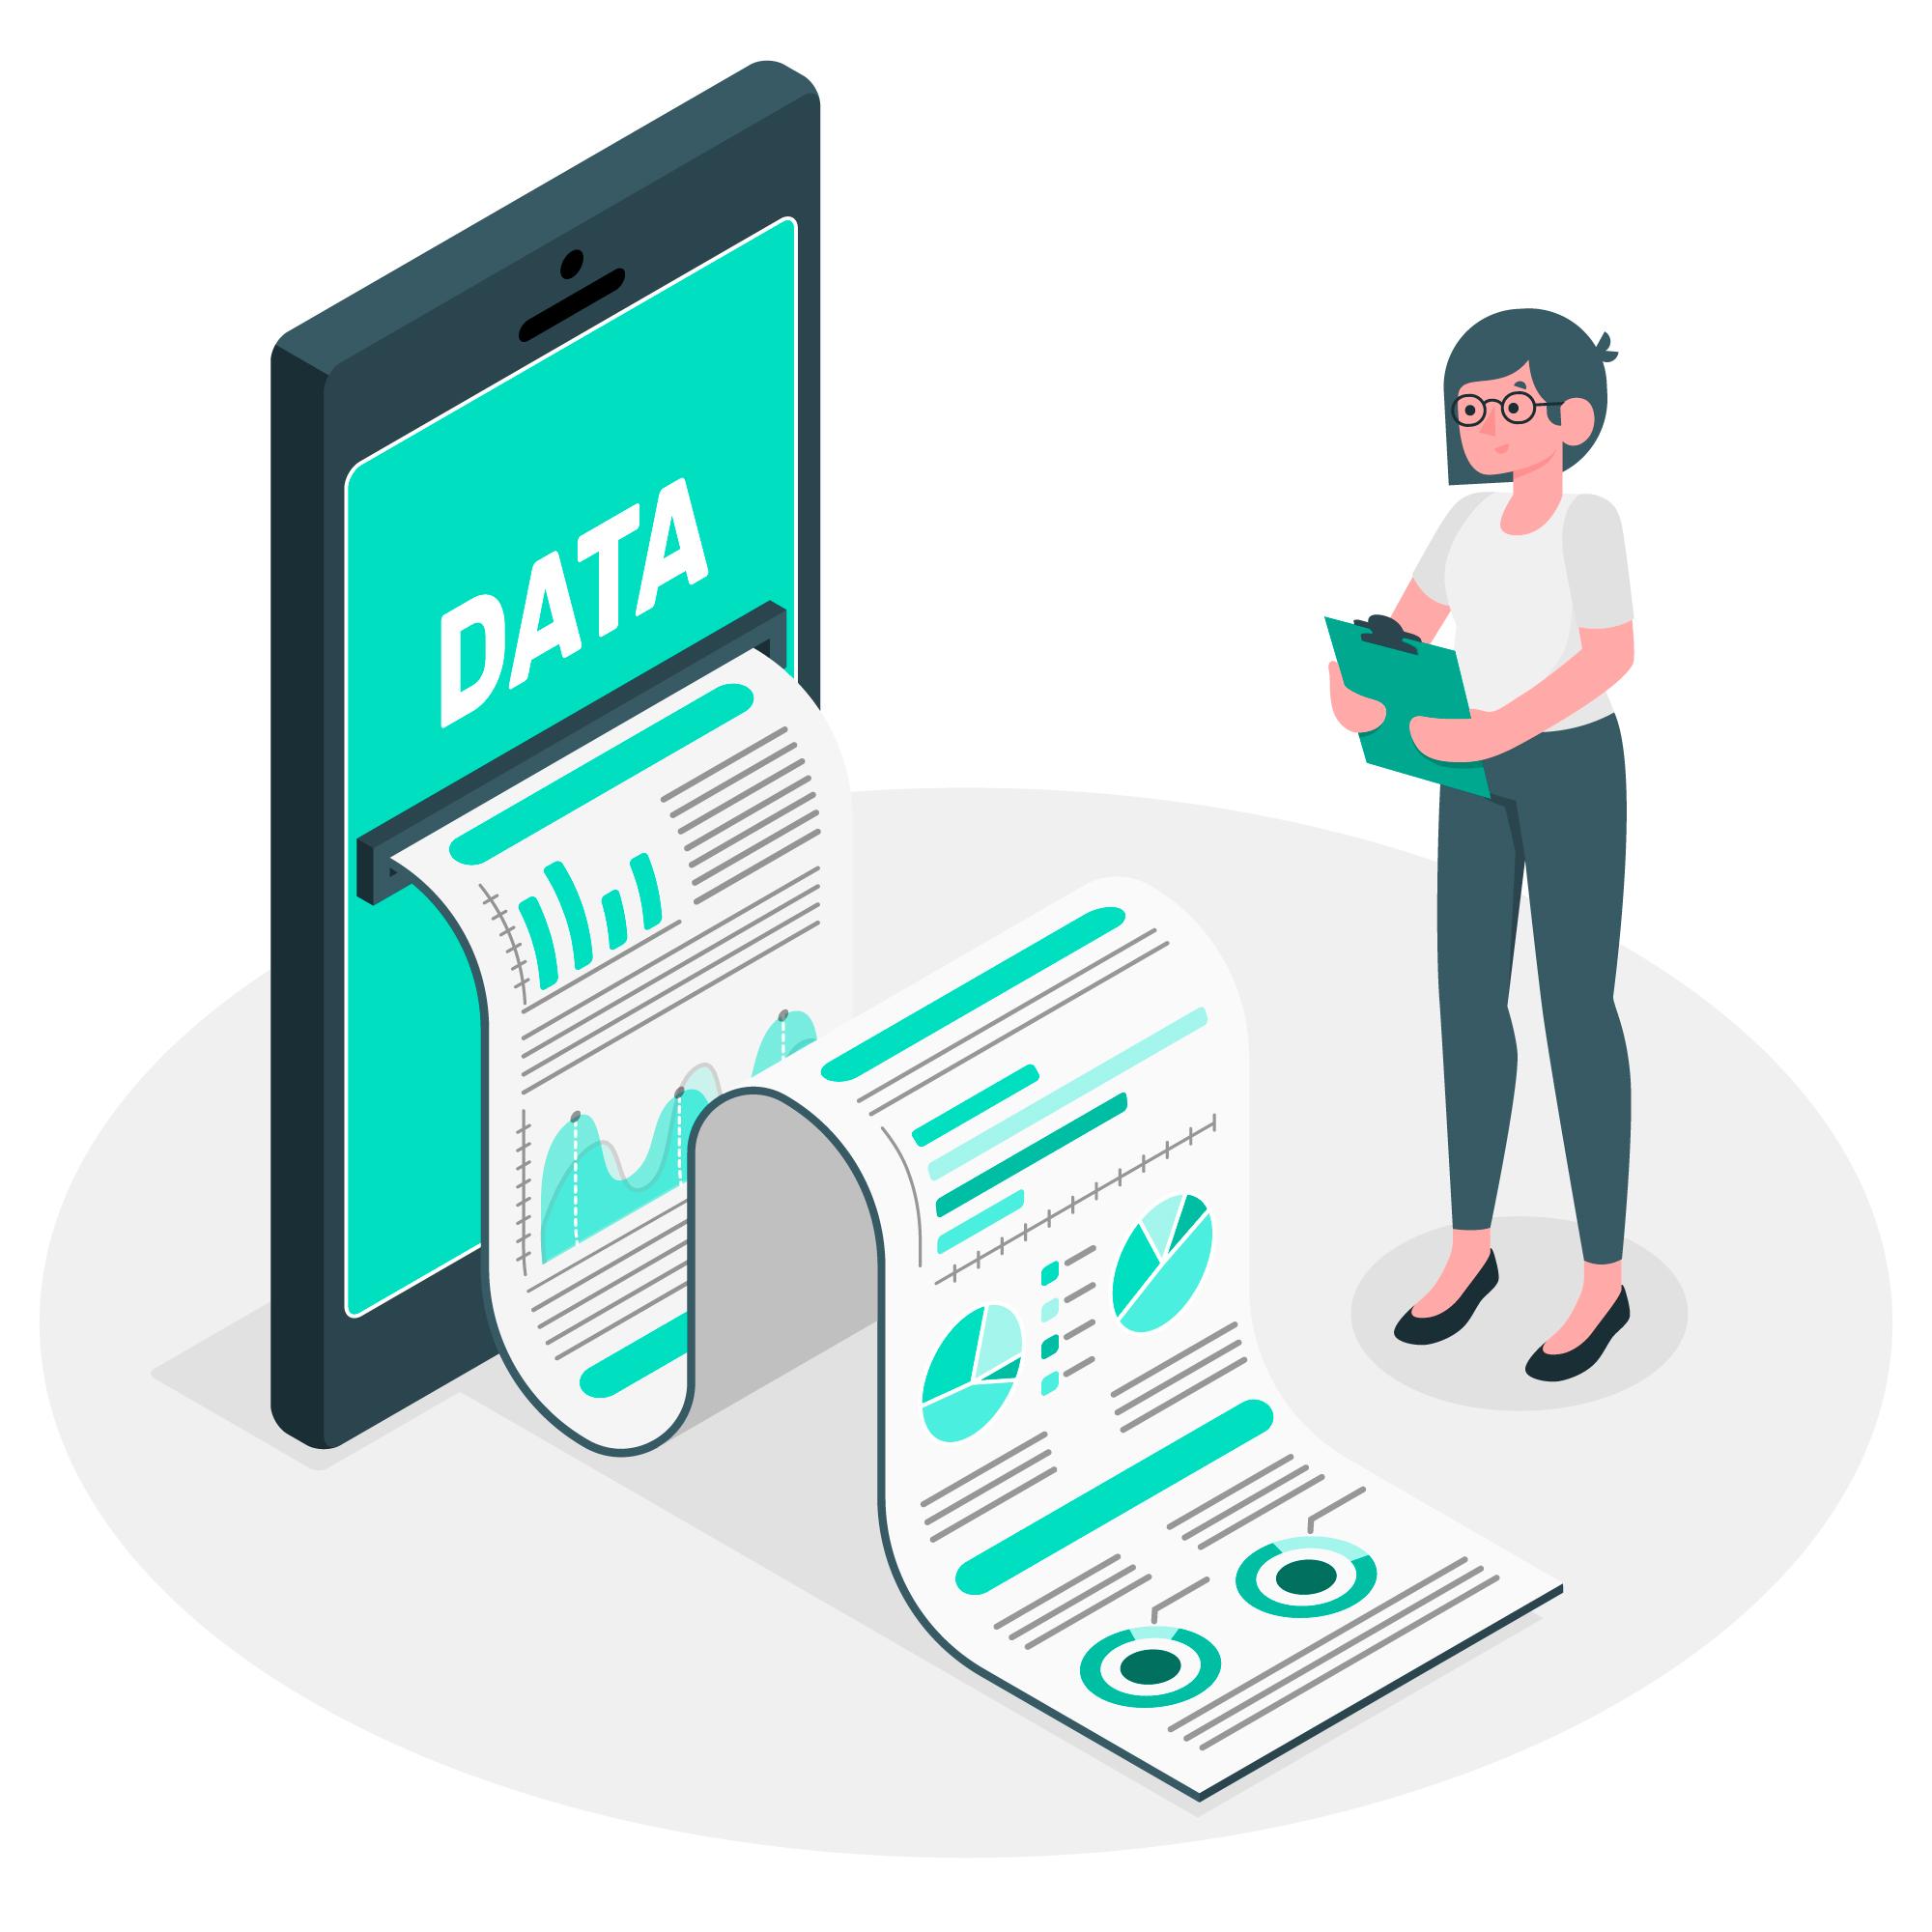 Statistical Data Analysis Help